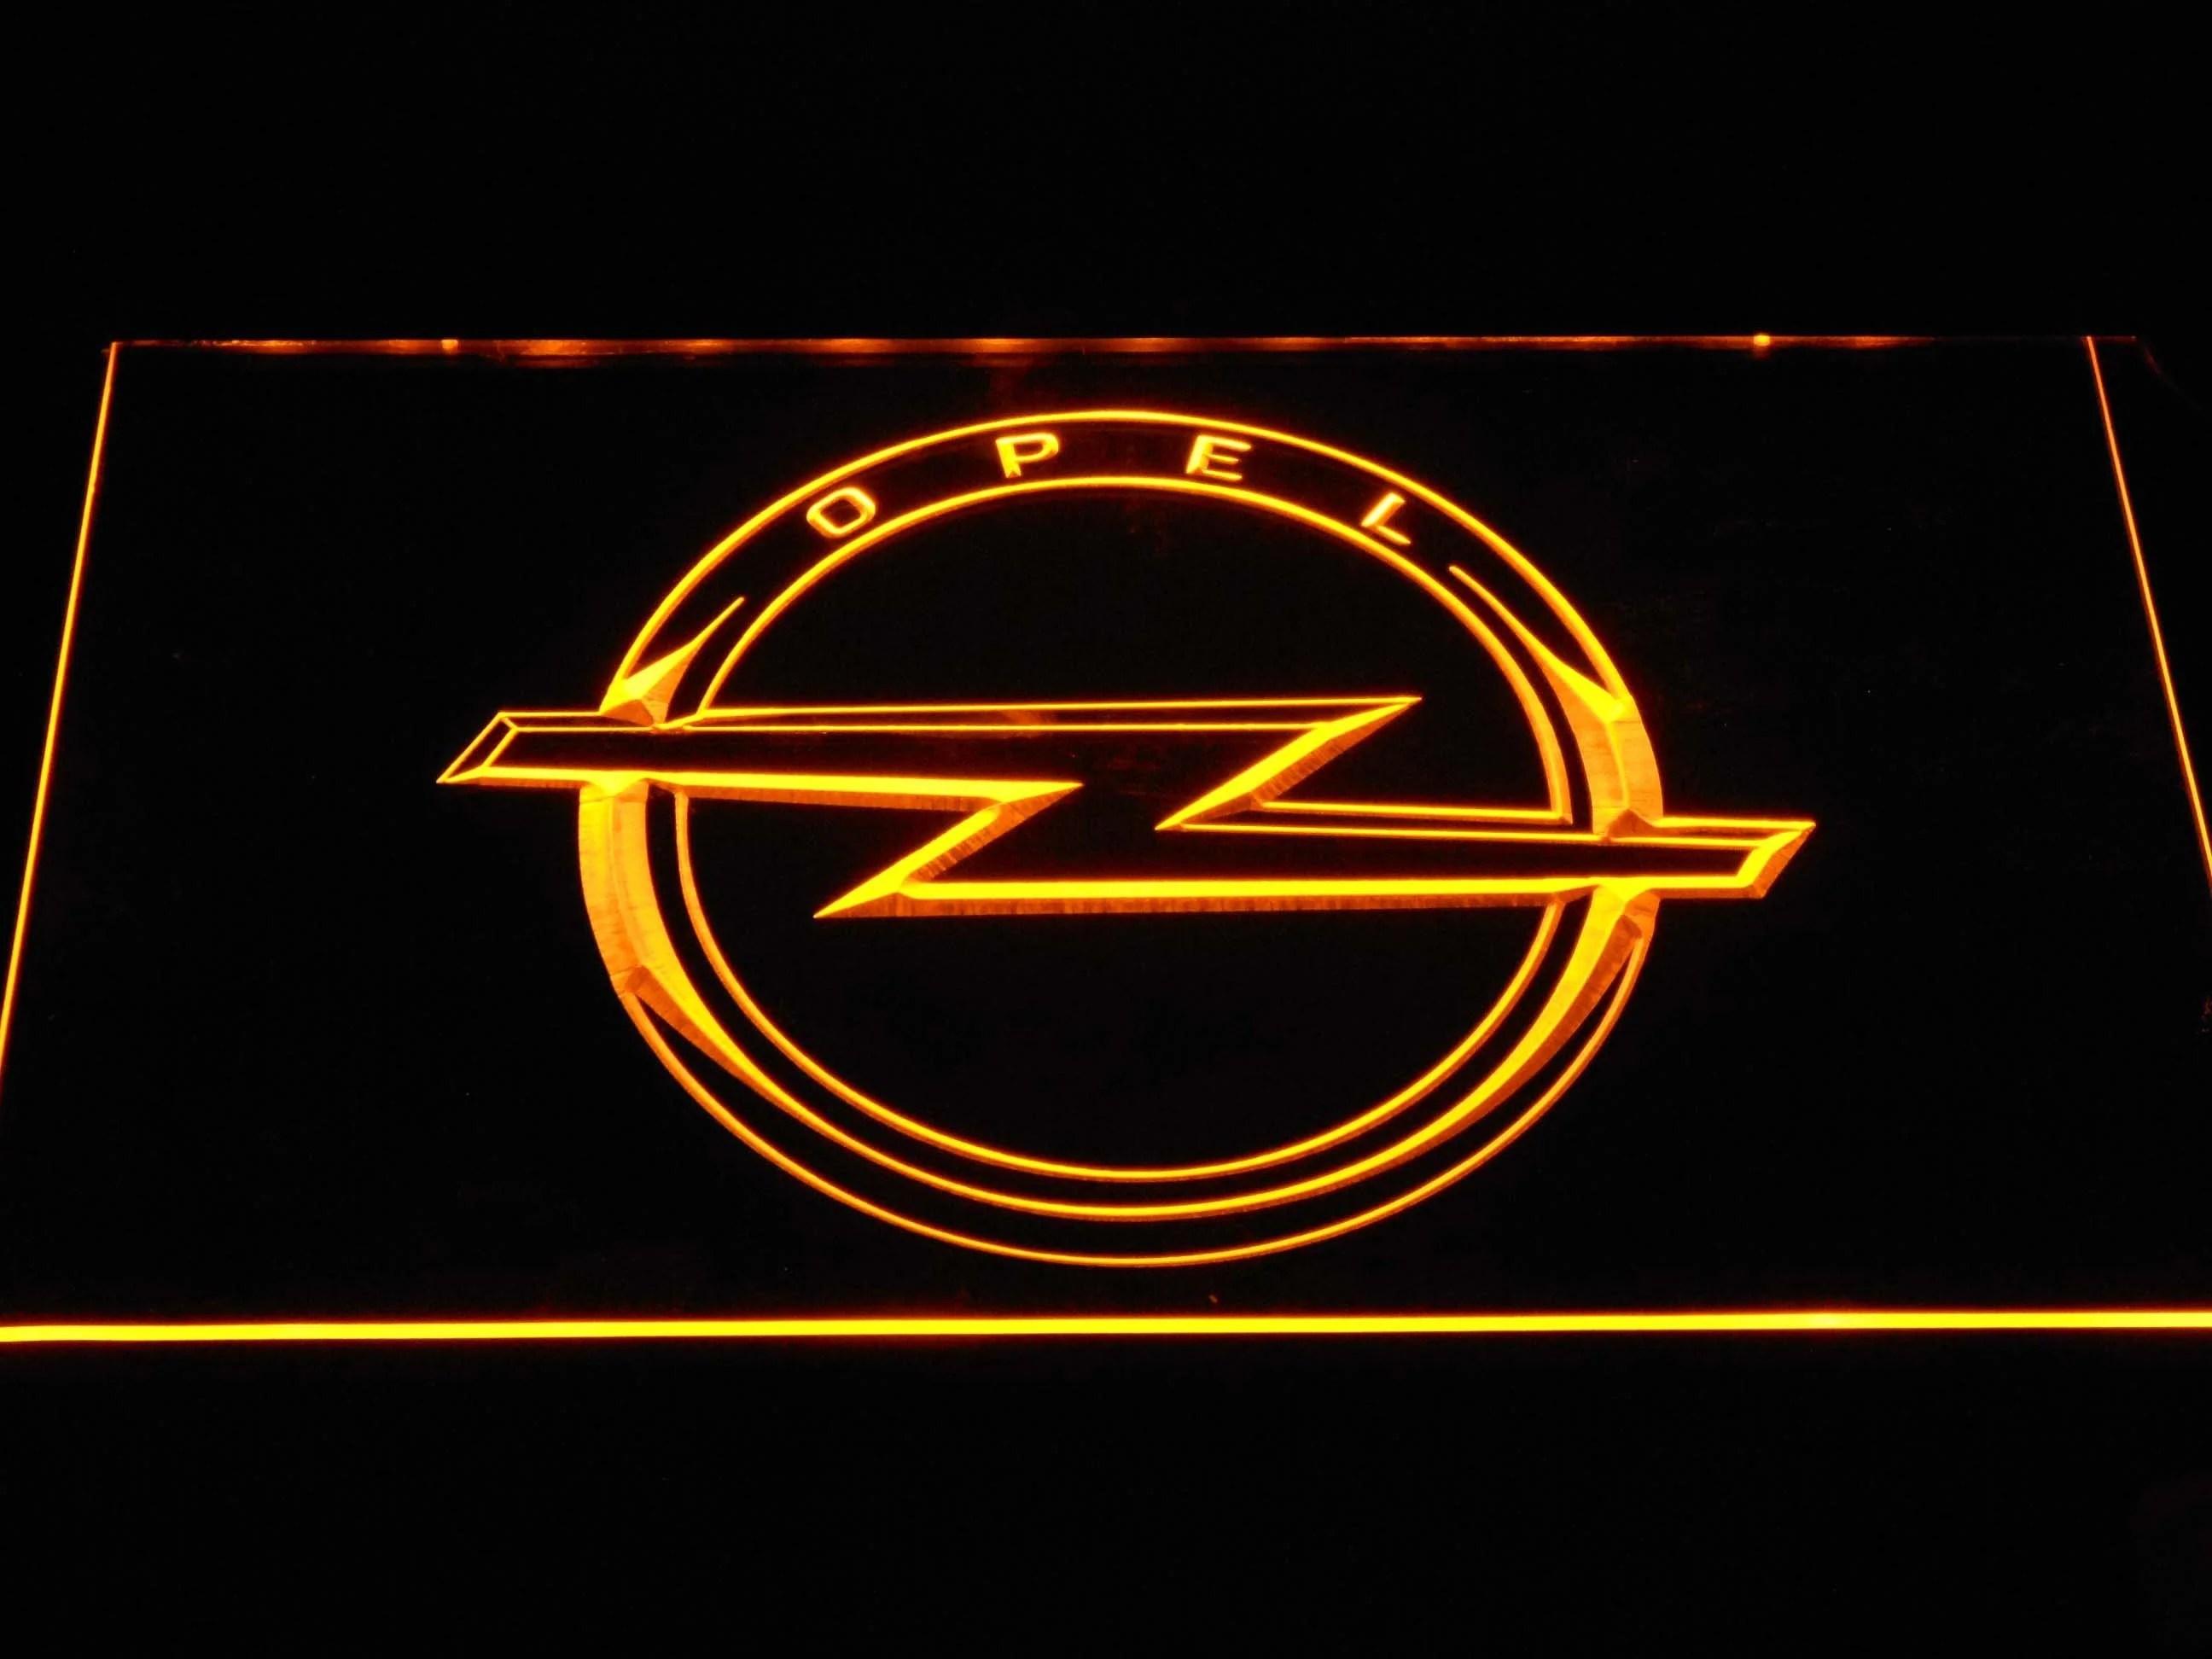 opel logo led neon sign [ 2592 x 1944 Pixel ]